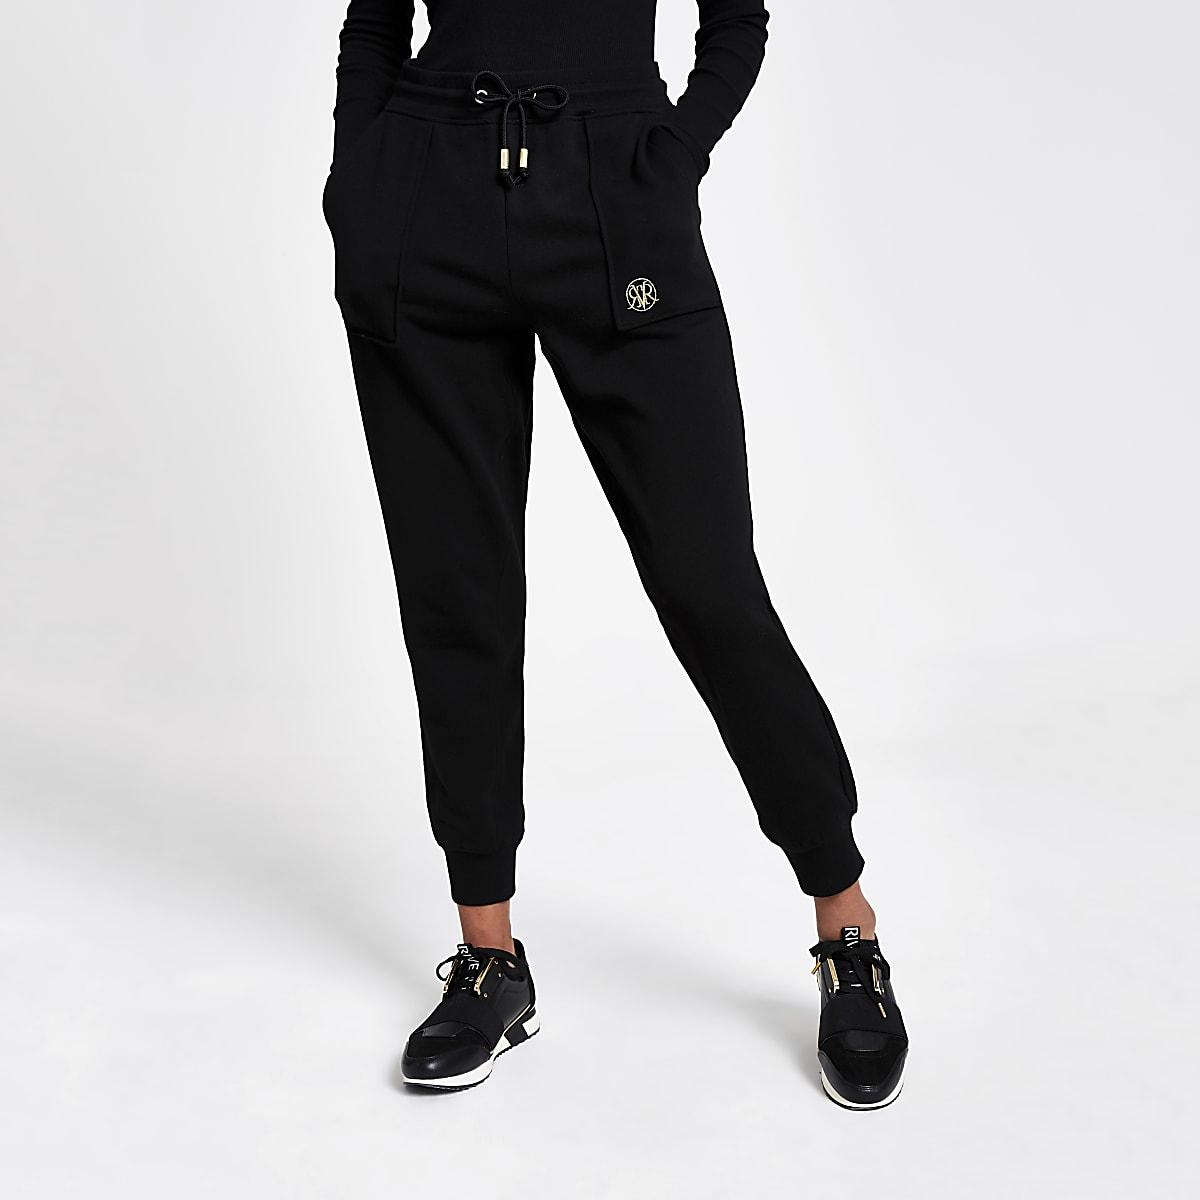 RVR - jogging noir brodé